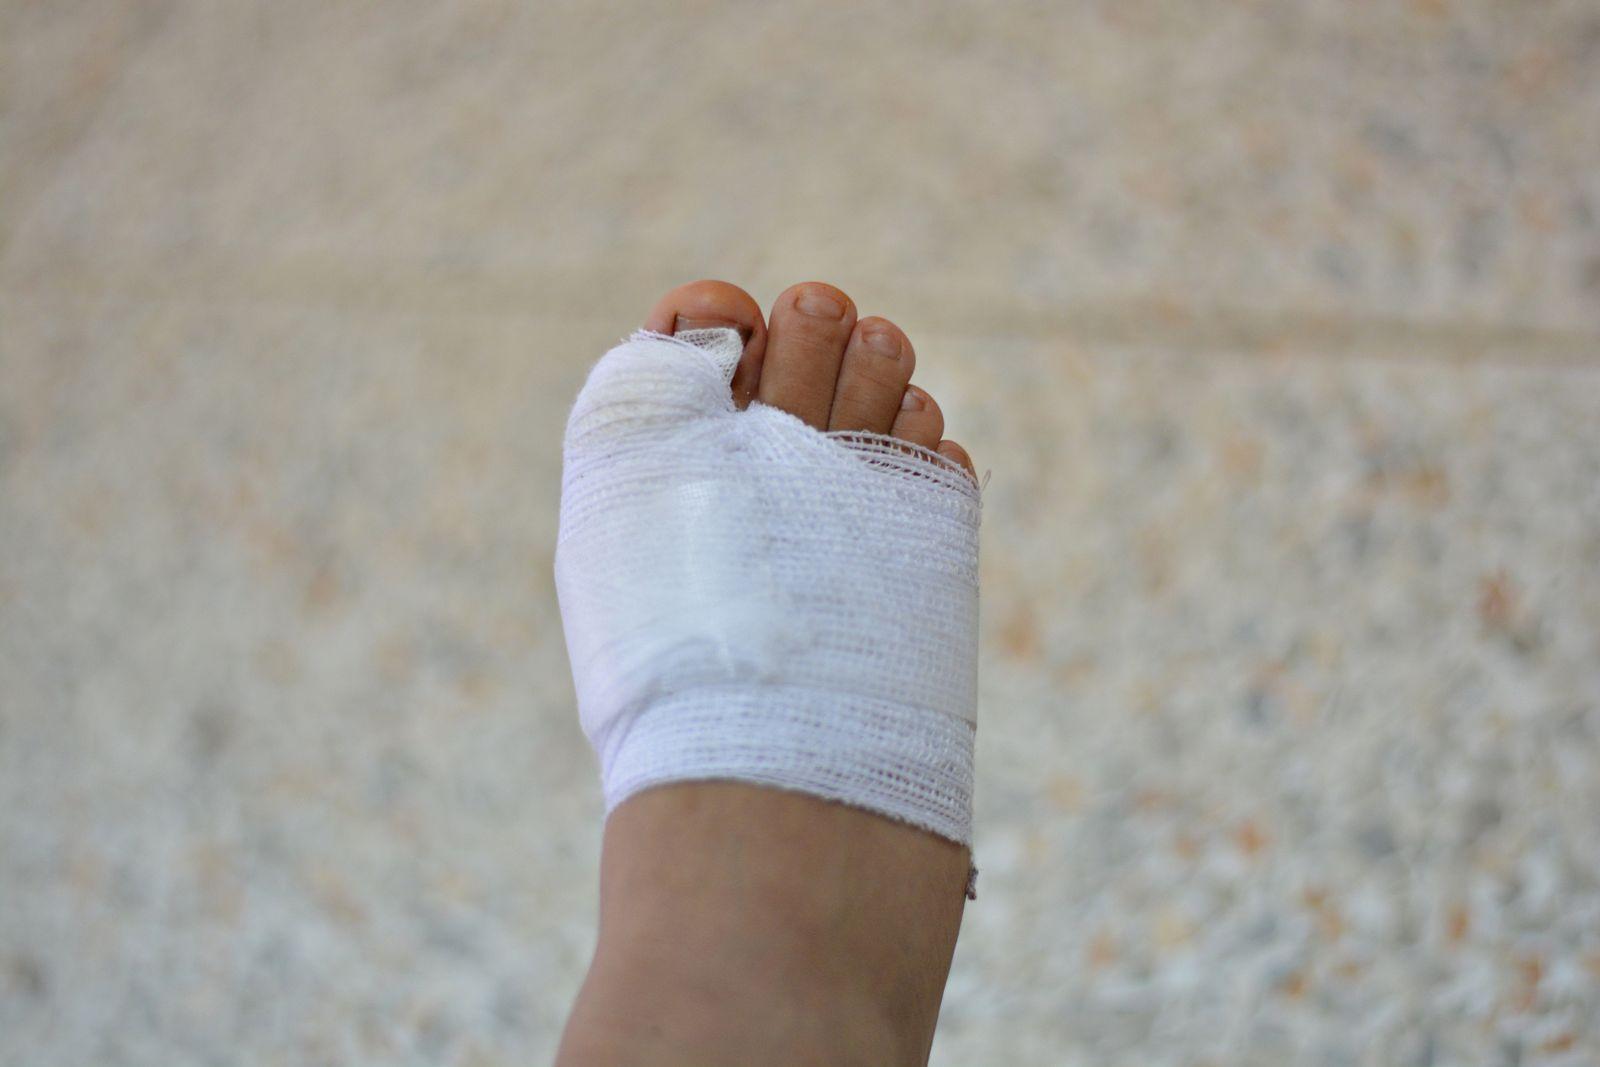 Houston podiatrist and foot surgeon considers surgery a last resort